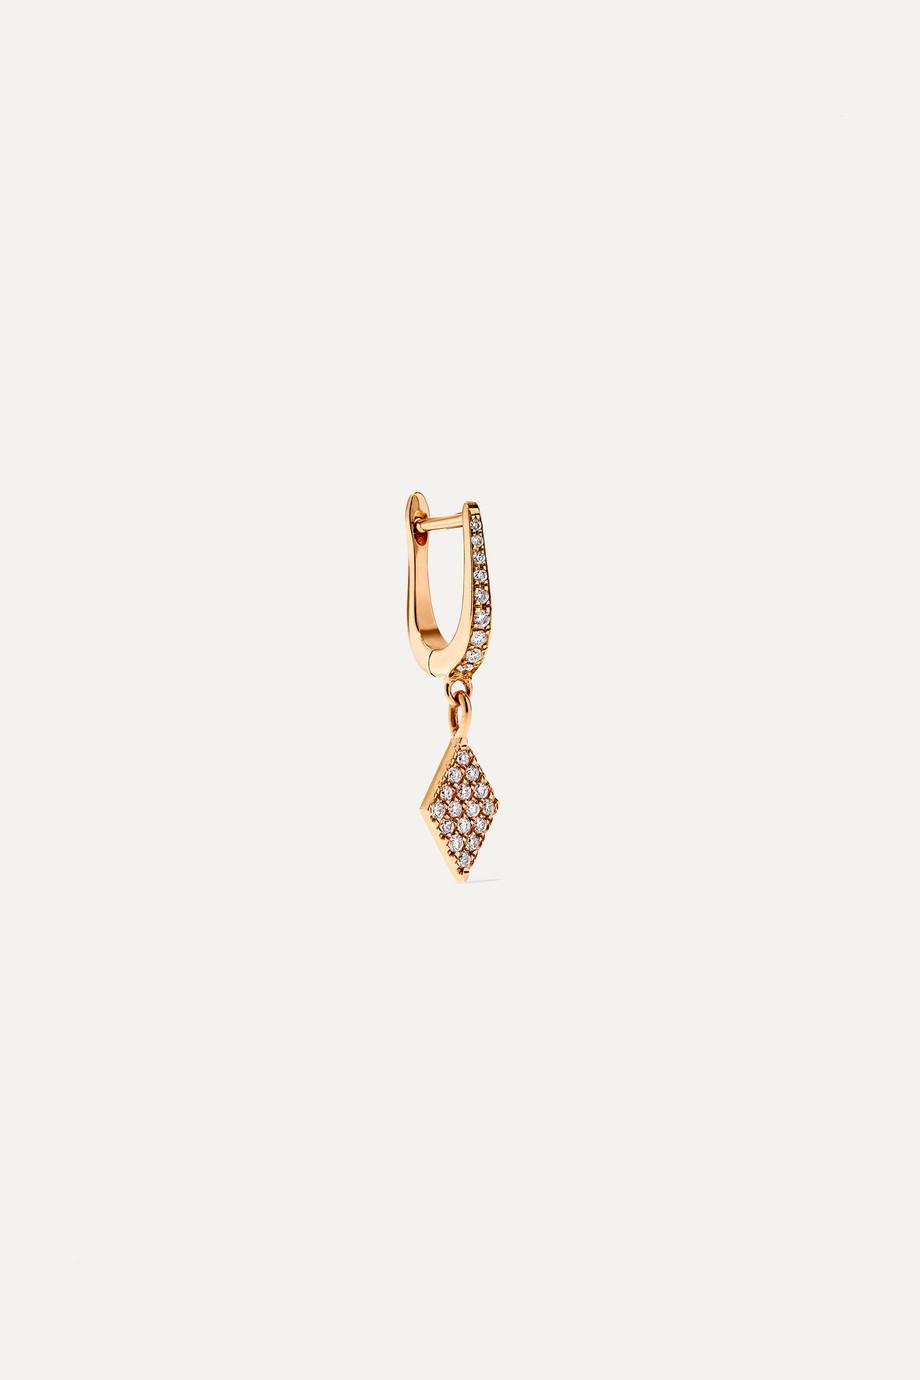 Diane Kordas 18K 玫瑰金钻石单只耳环